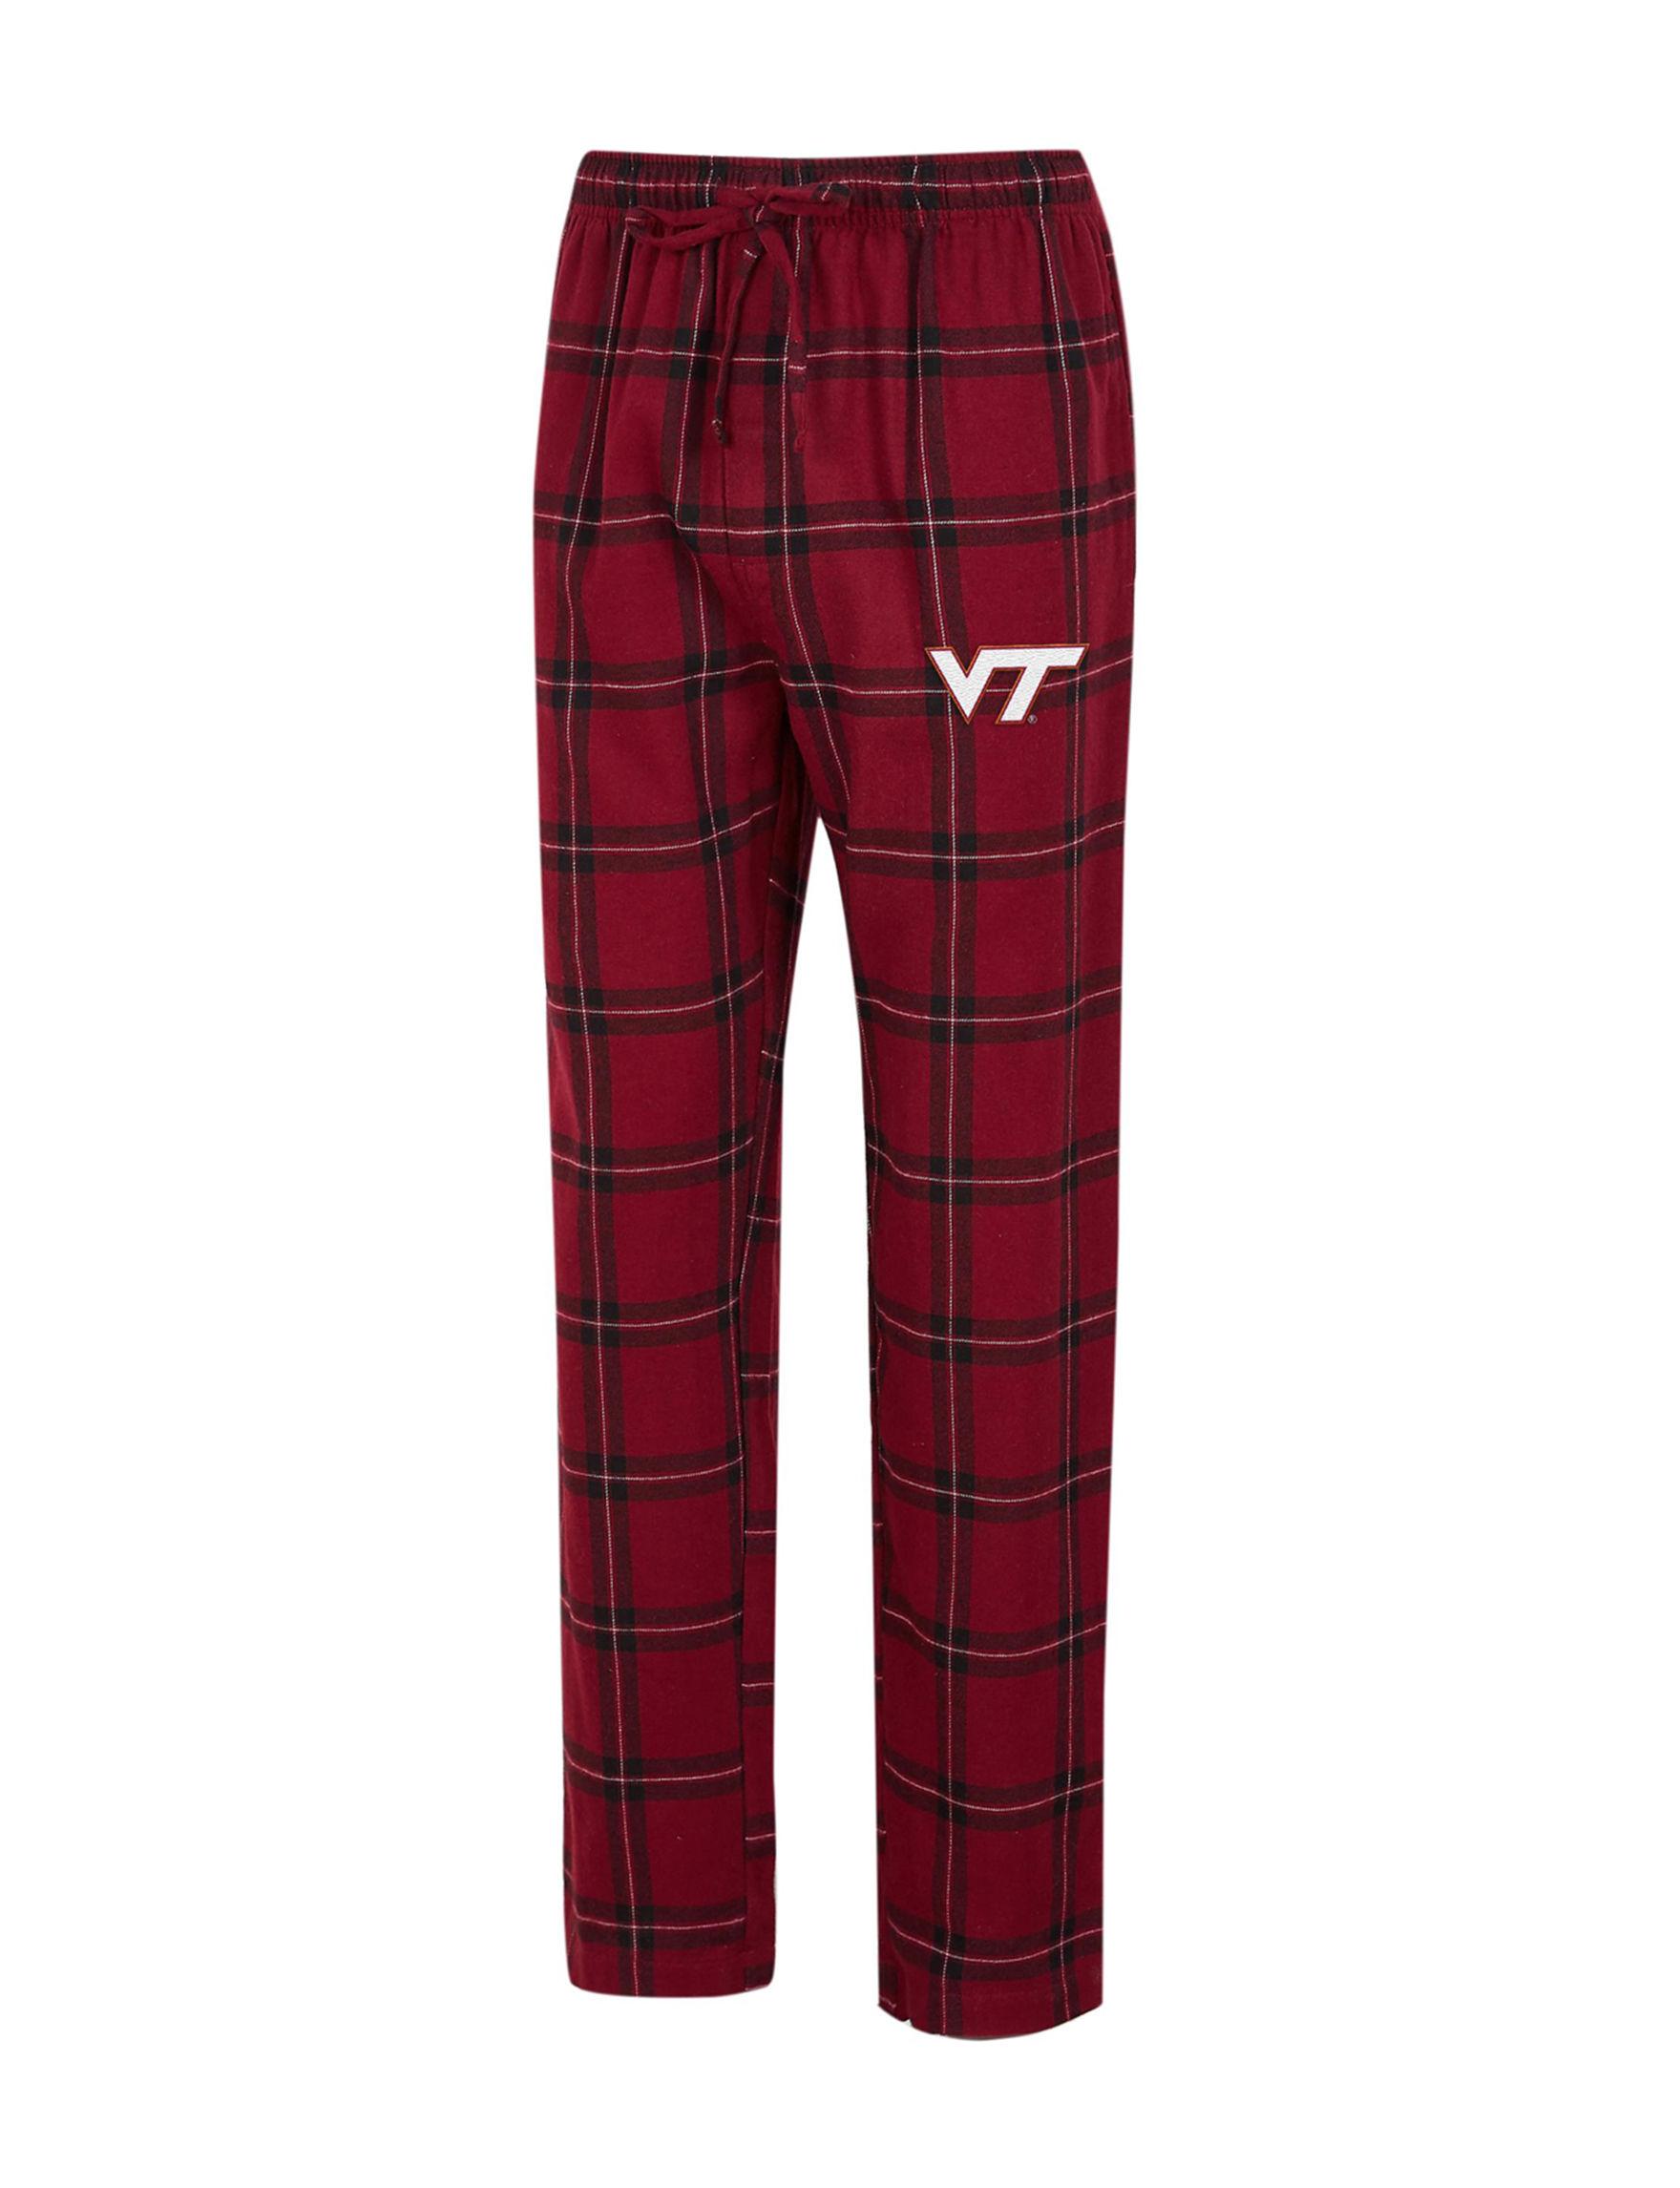 NCAA Red / Black Pajama Bottoms